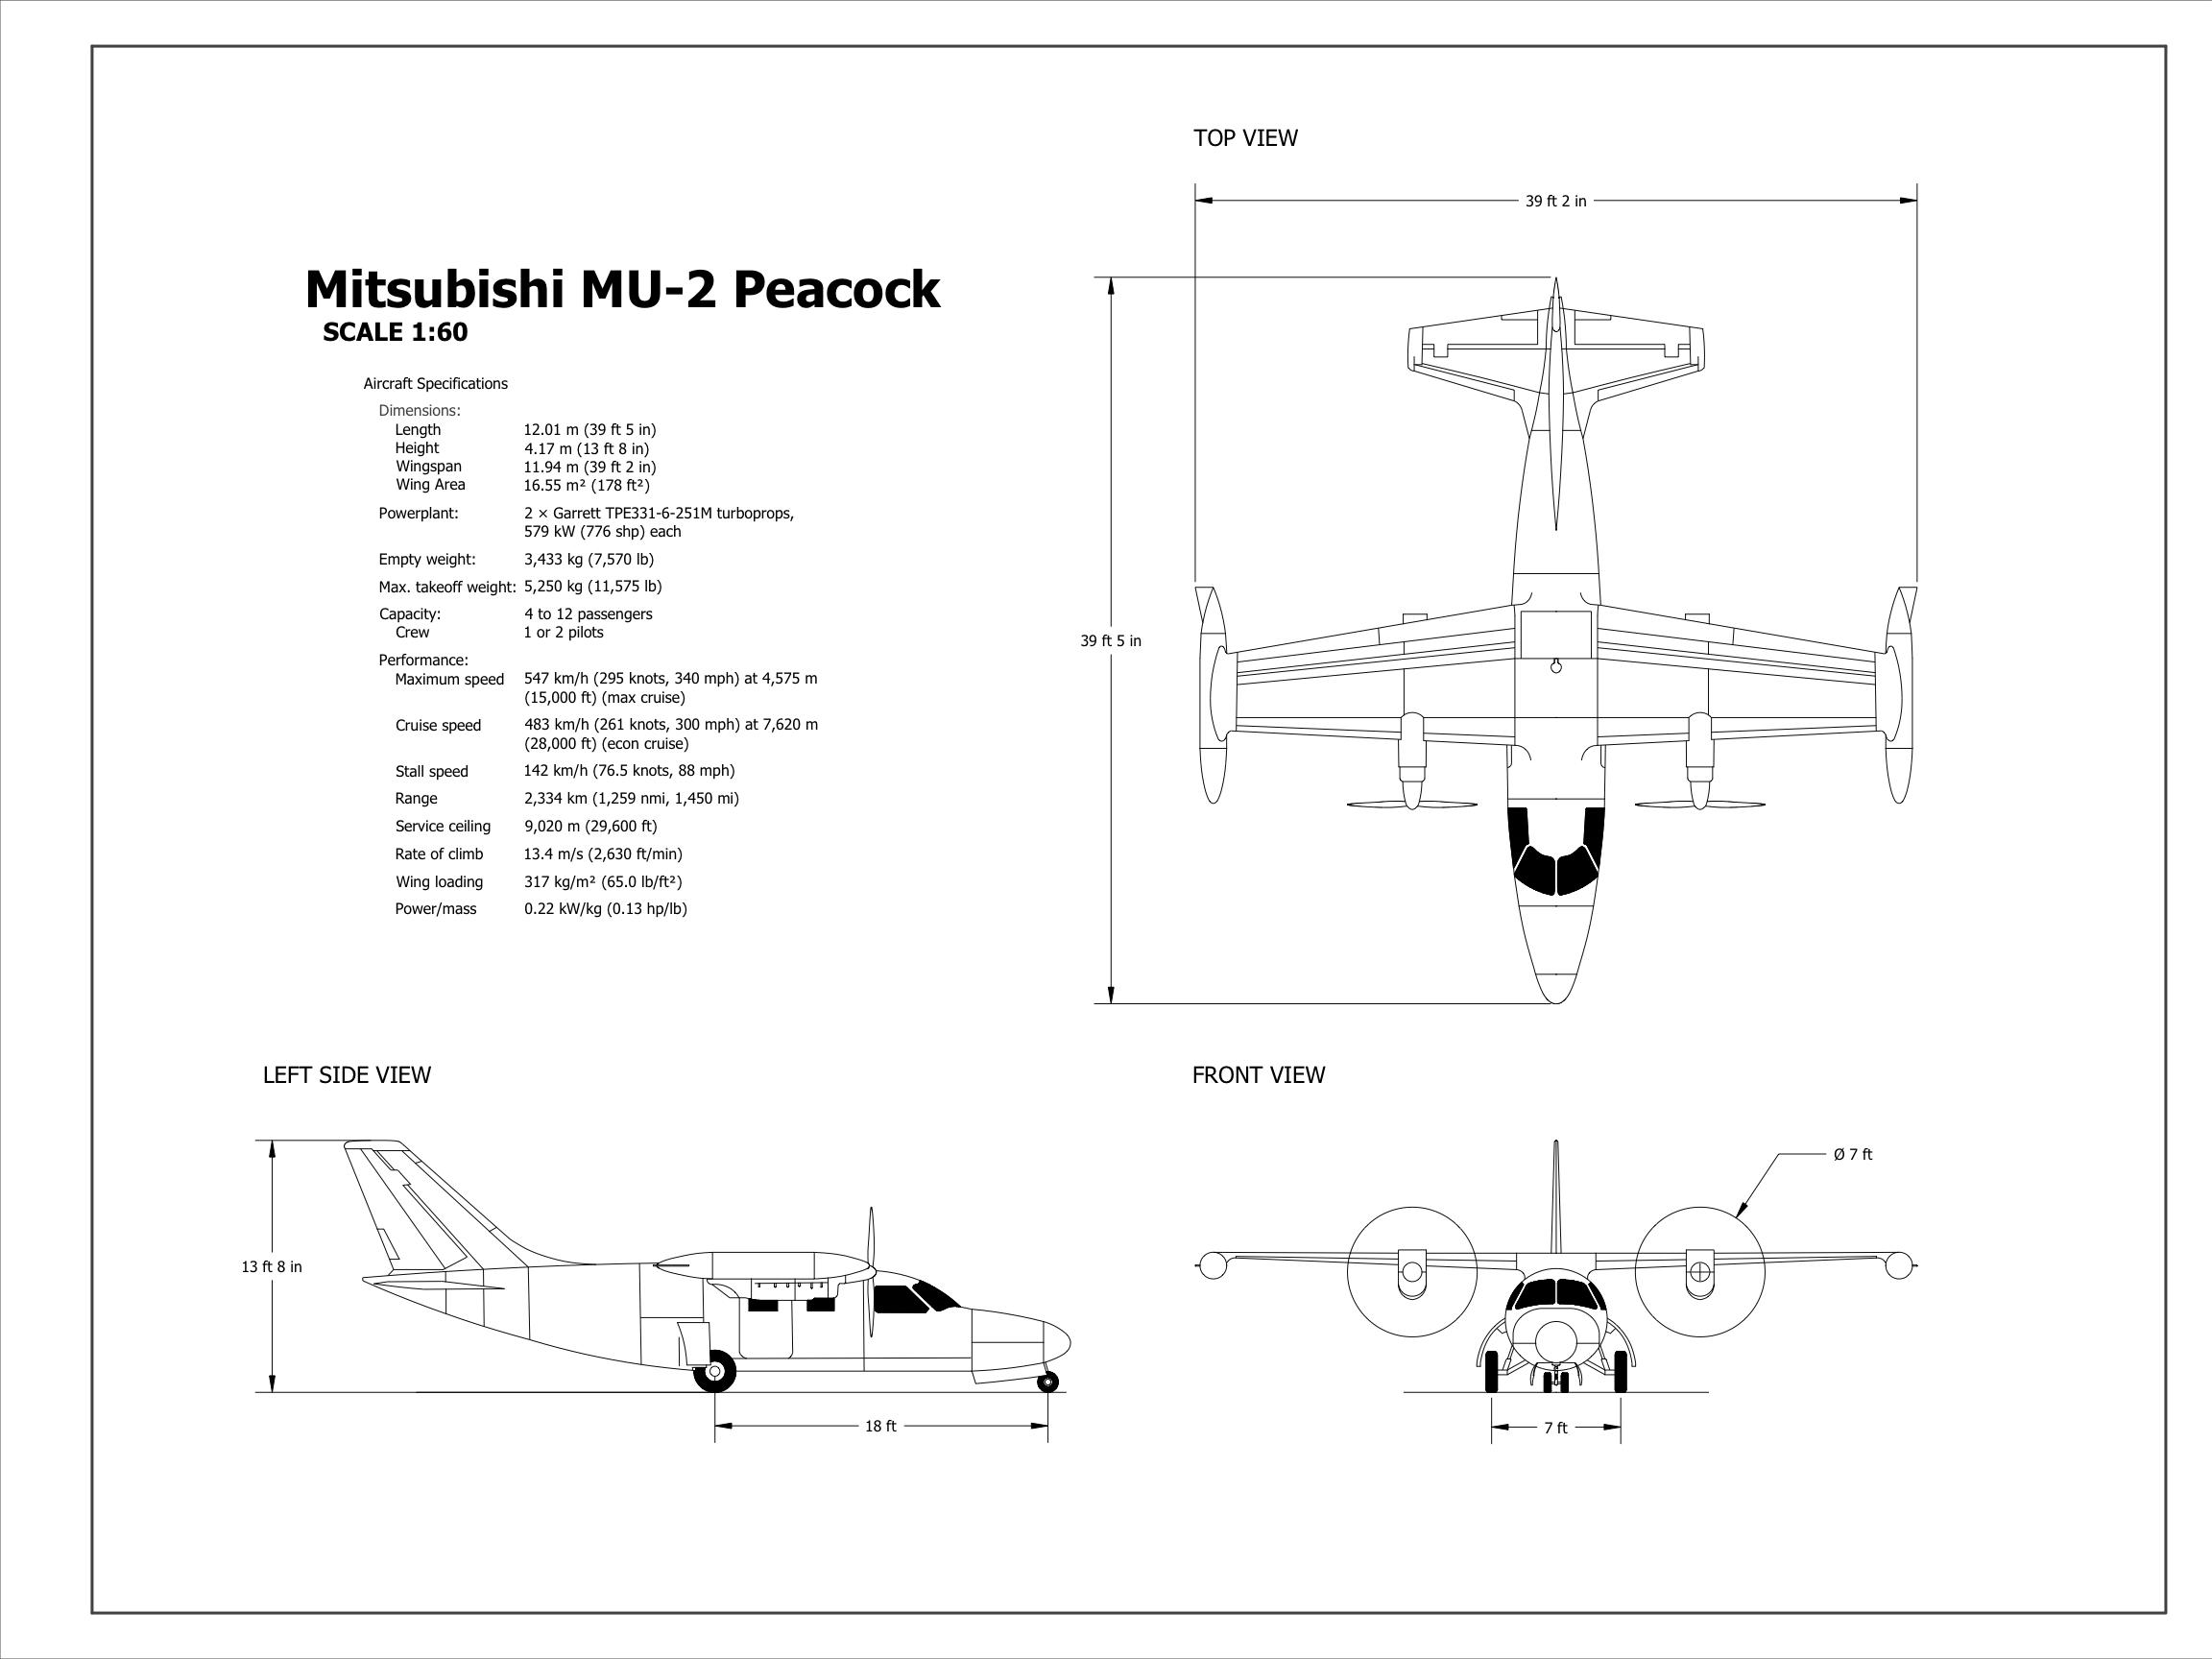 [DIAGRAM_4FR]  Mitsubishi MU-2 Peacock Aircraft - CAD Files, DWG files, Plans and Details | Mitsubishi Mu 2 Schematic |  | PlanMarketplace